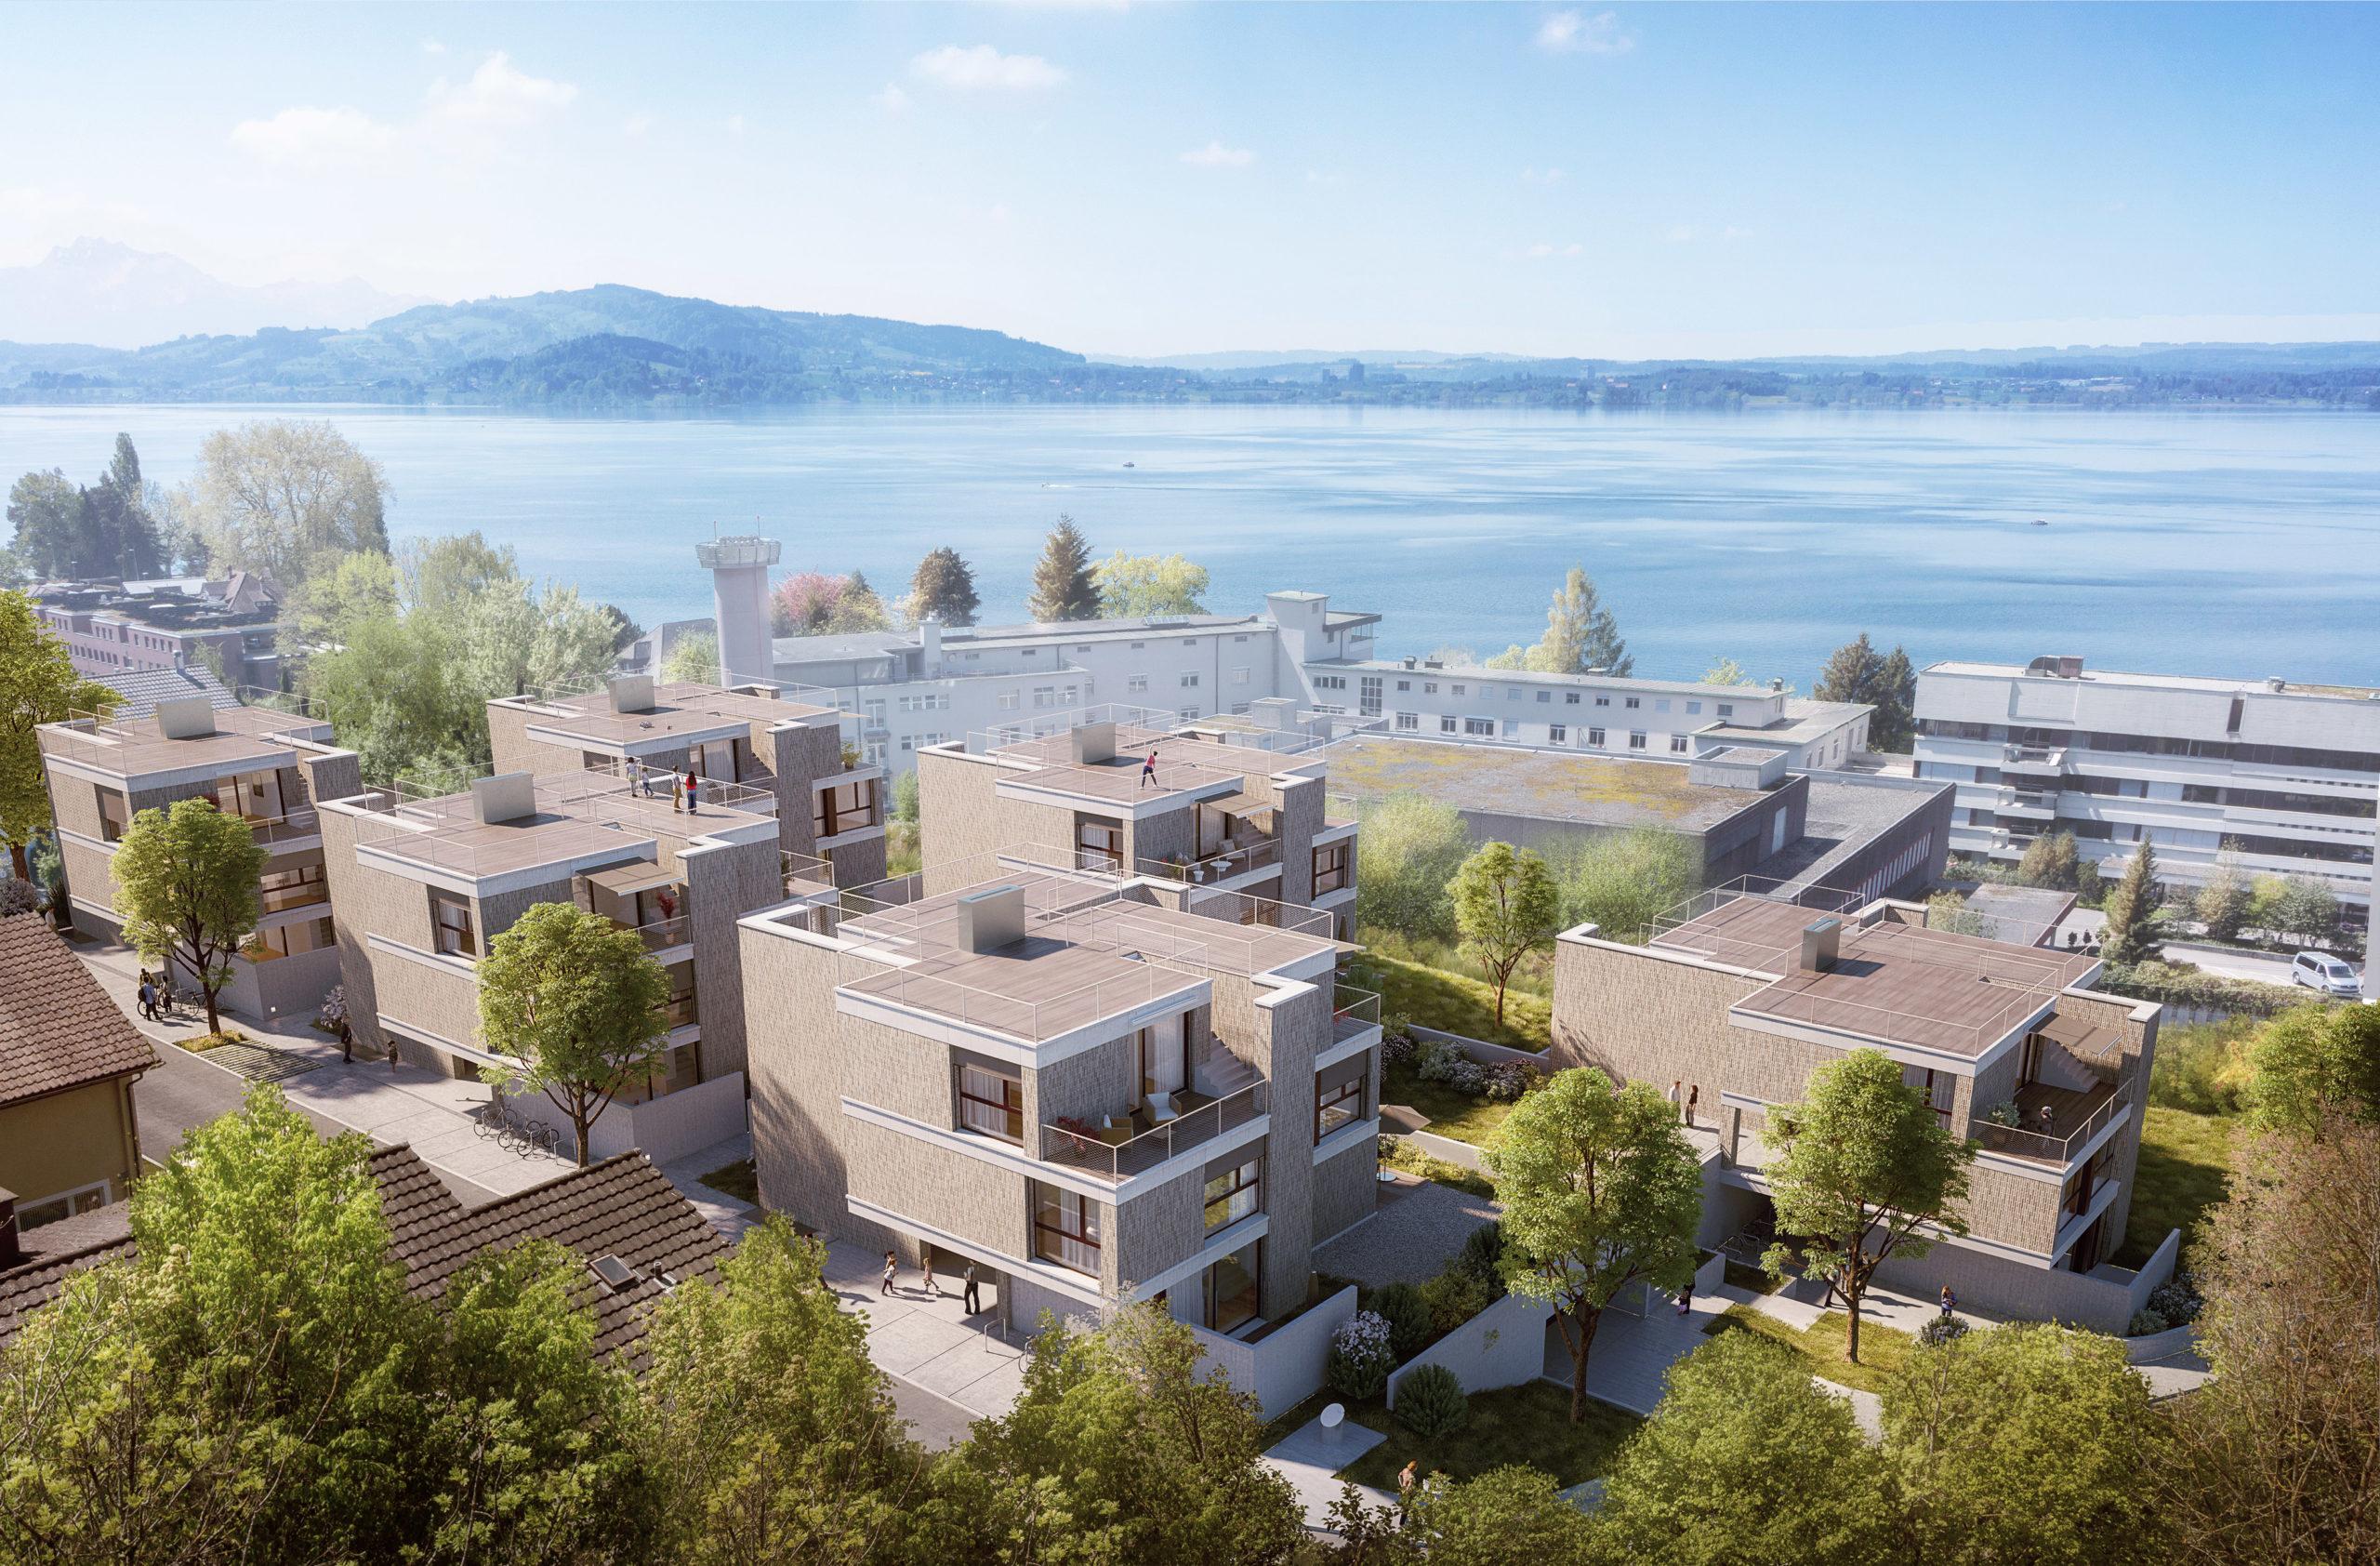 08 Townhouses scaled Advendis Immobilien-Kompetenz aus einer Hand